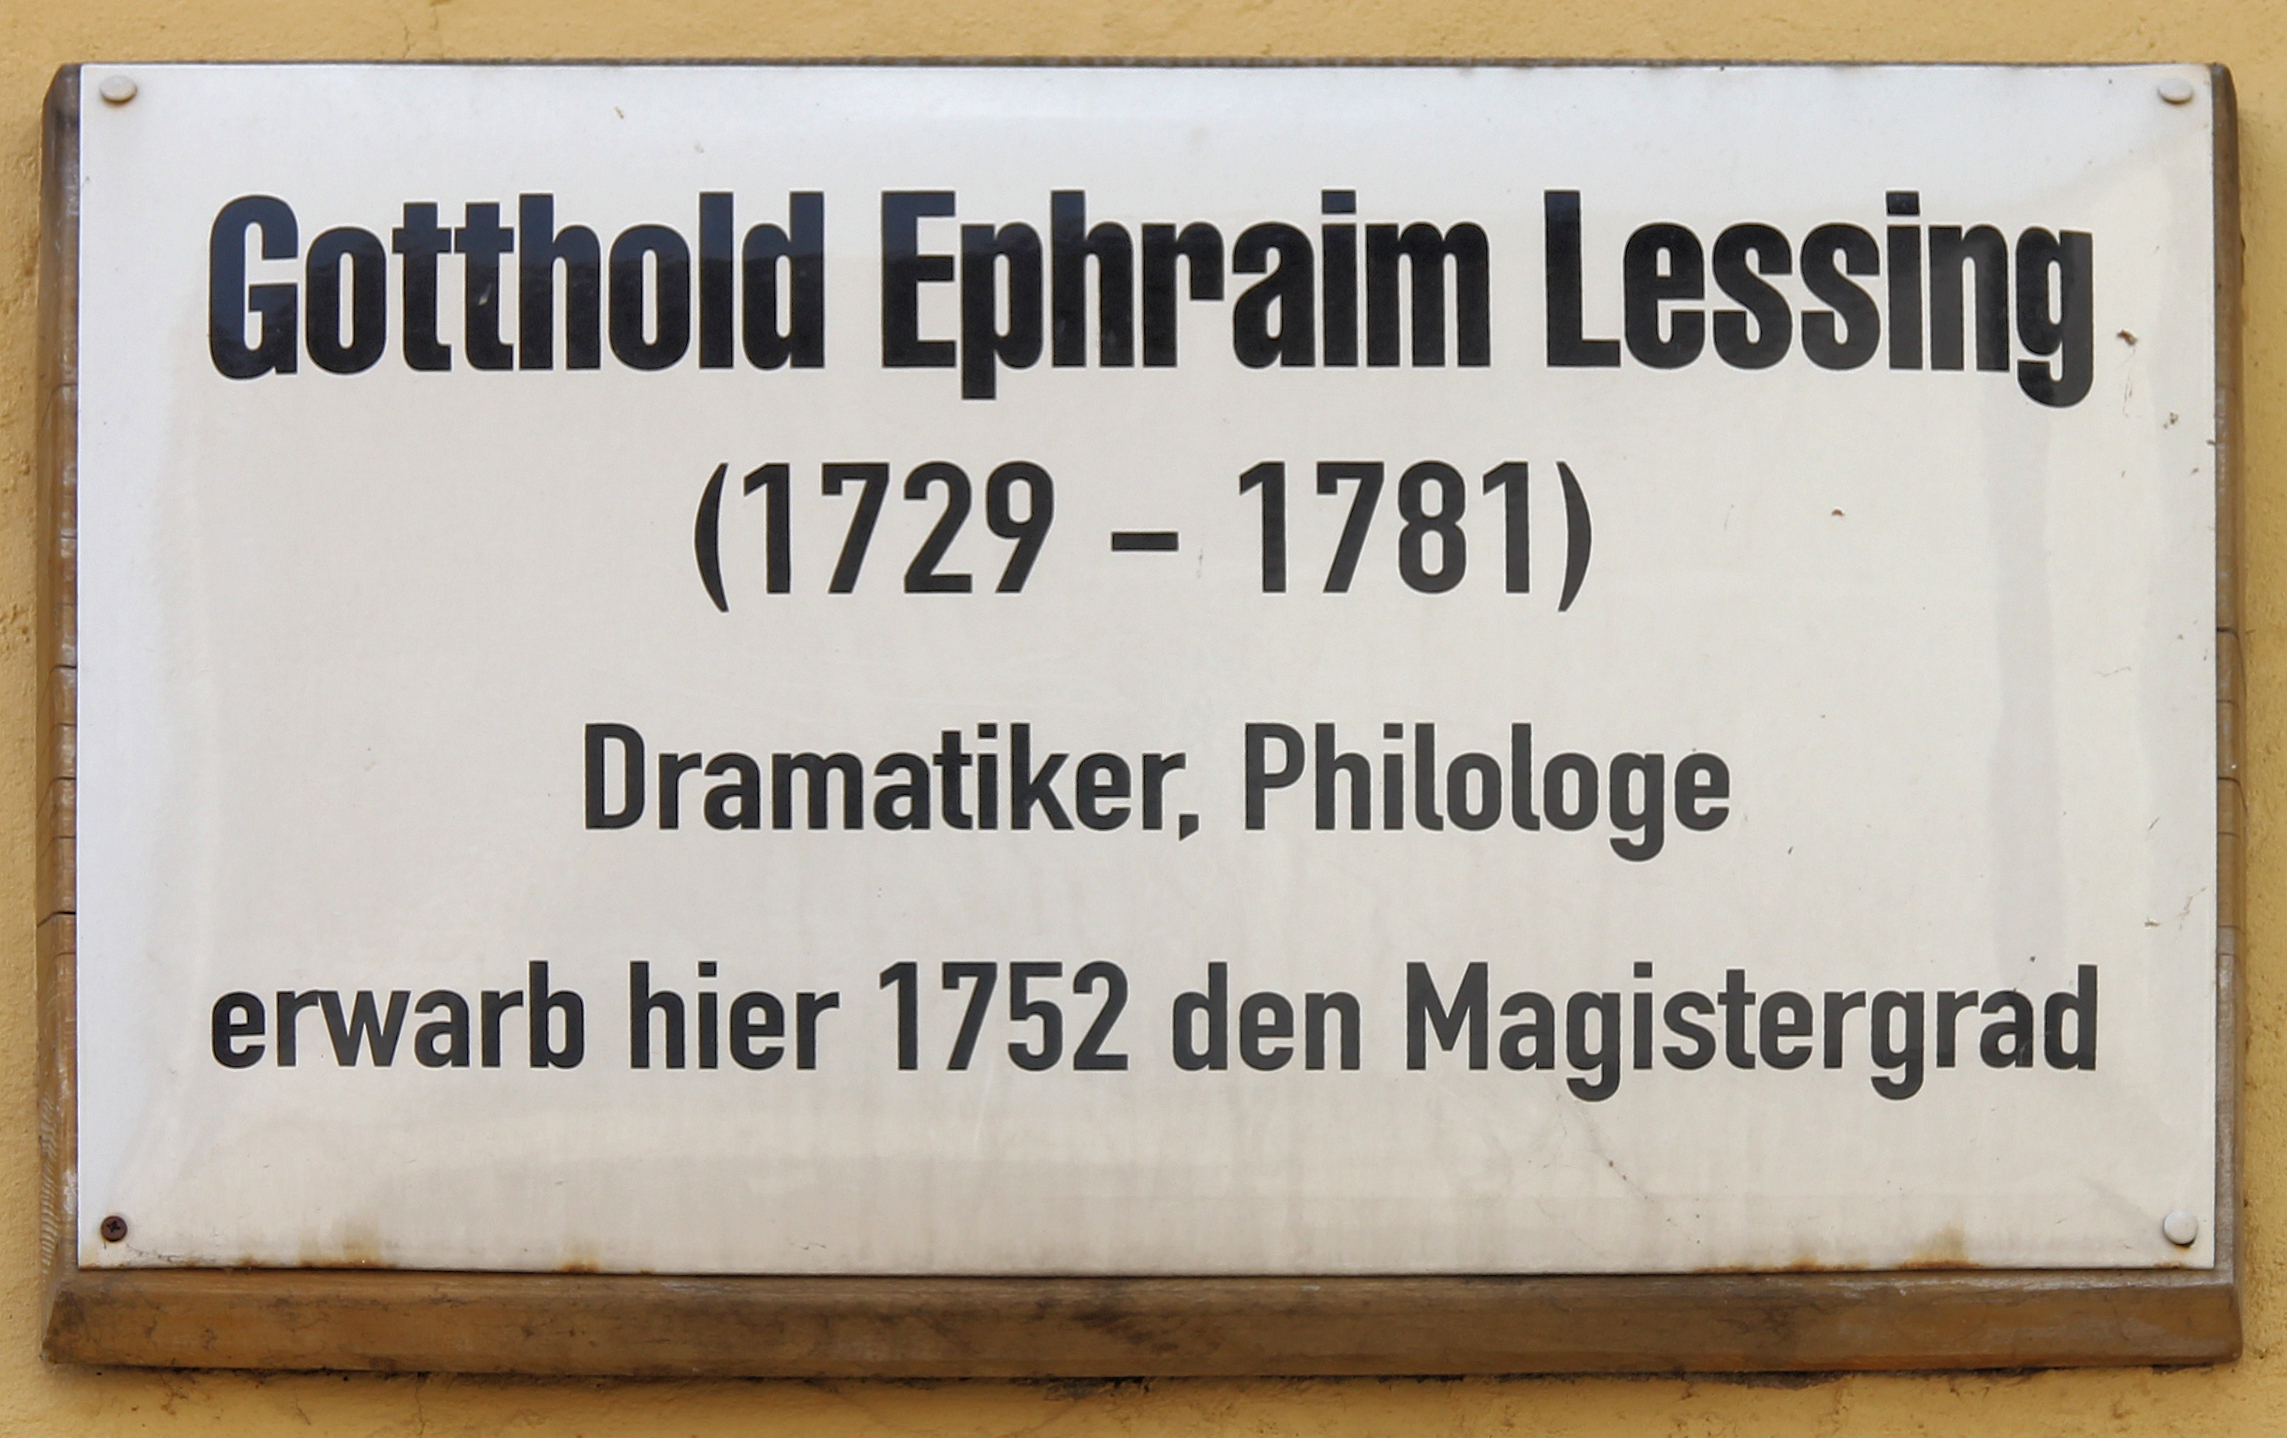 Datei Gedenktafel Kirchplatz 26 Wittenberg Gotthold Ephraim